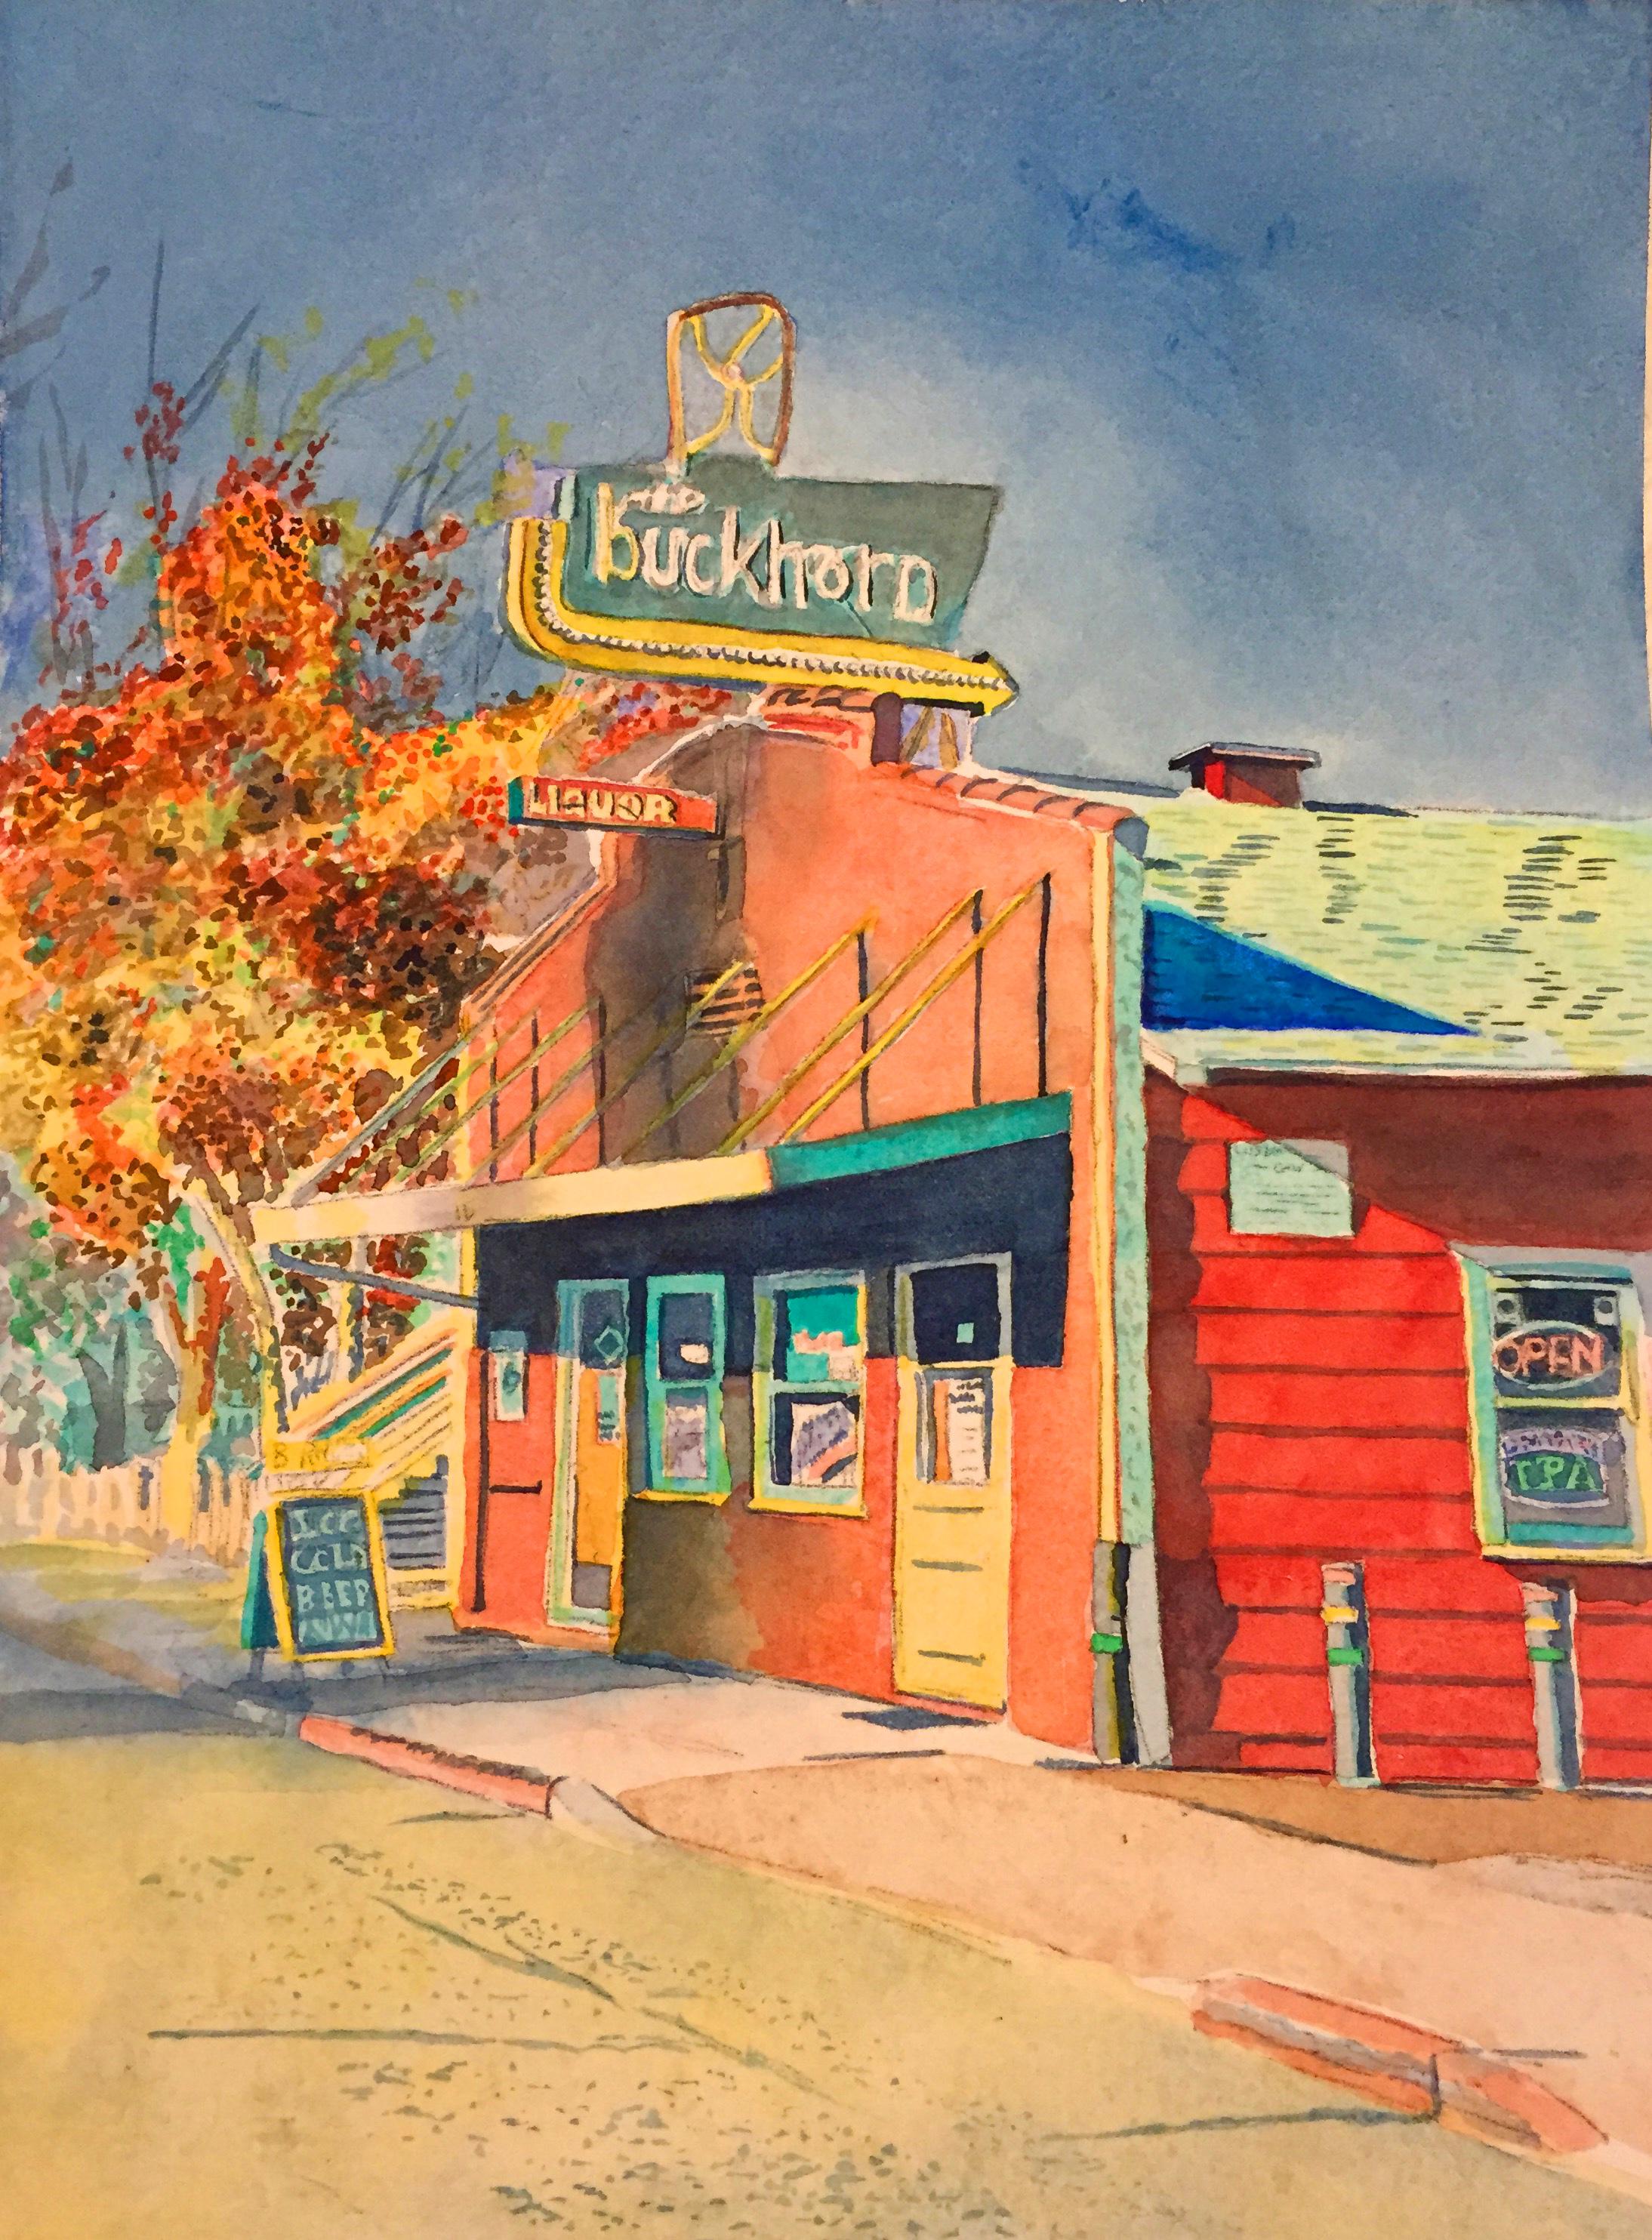 "Title: The Buckhorn, Petaluma 2017    Media: watercolors    Dimensions: 8.5"" x 11""    Collection of the Artist"